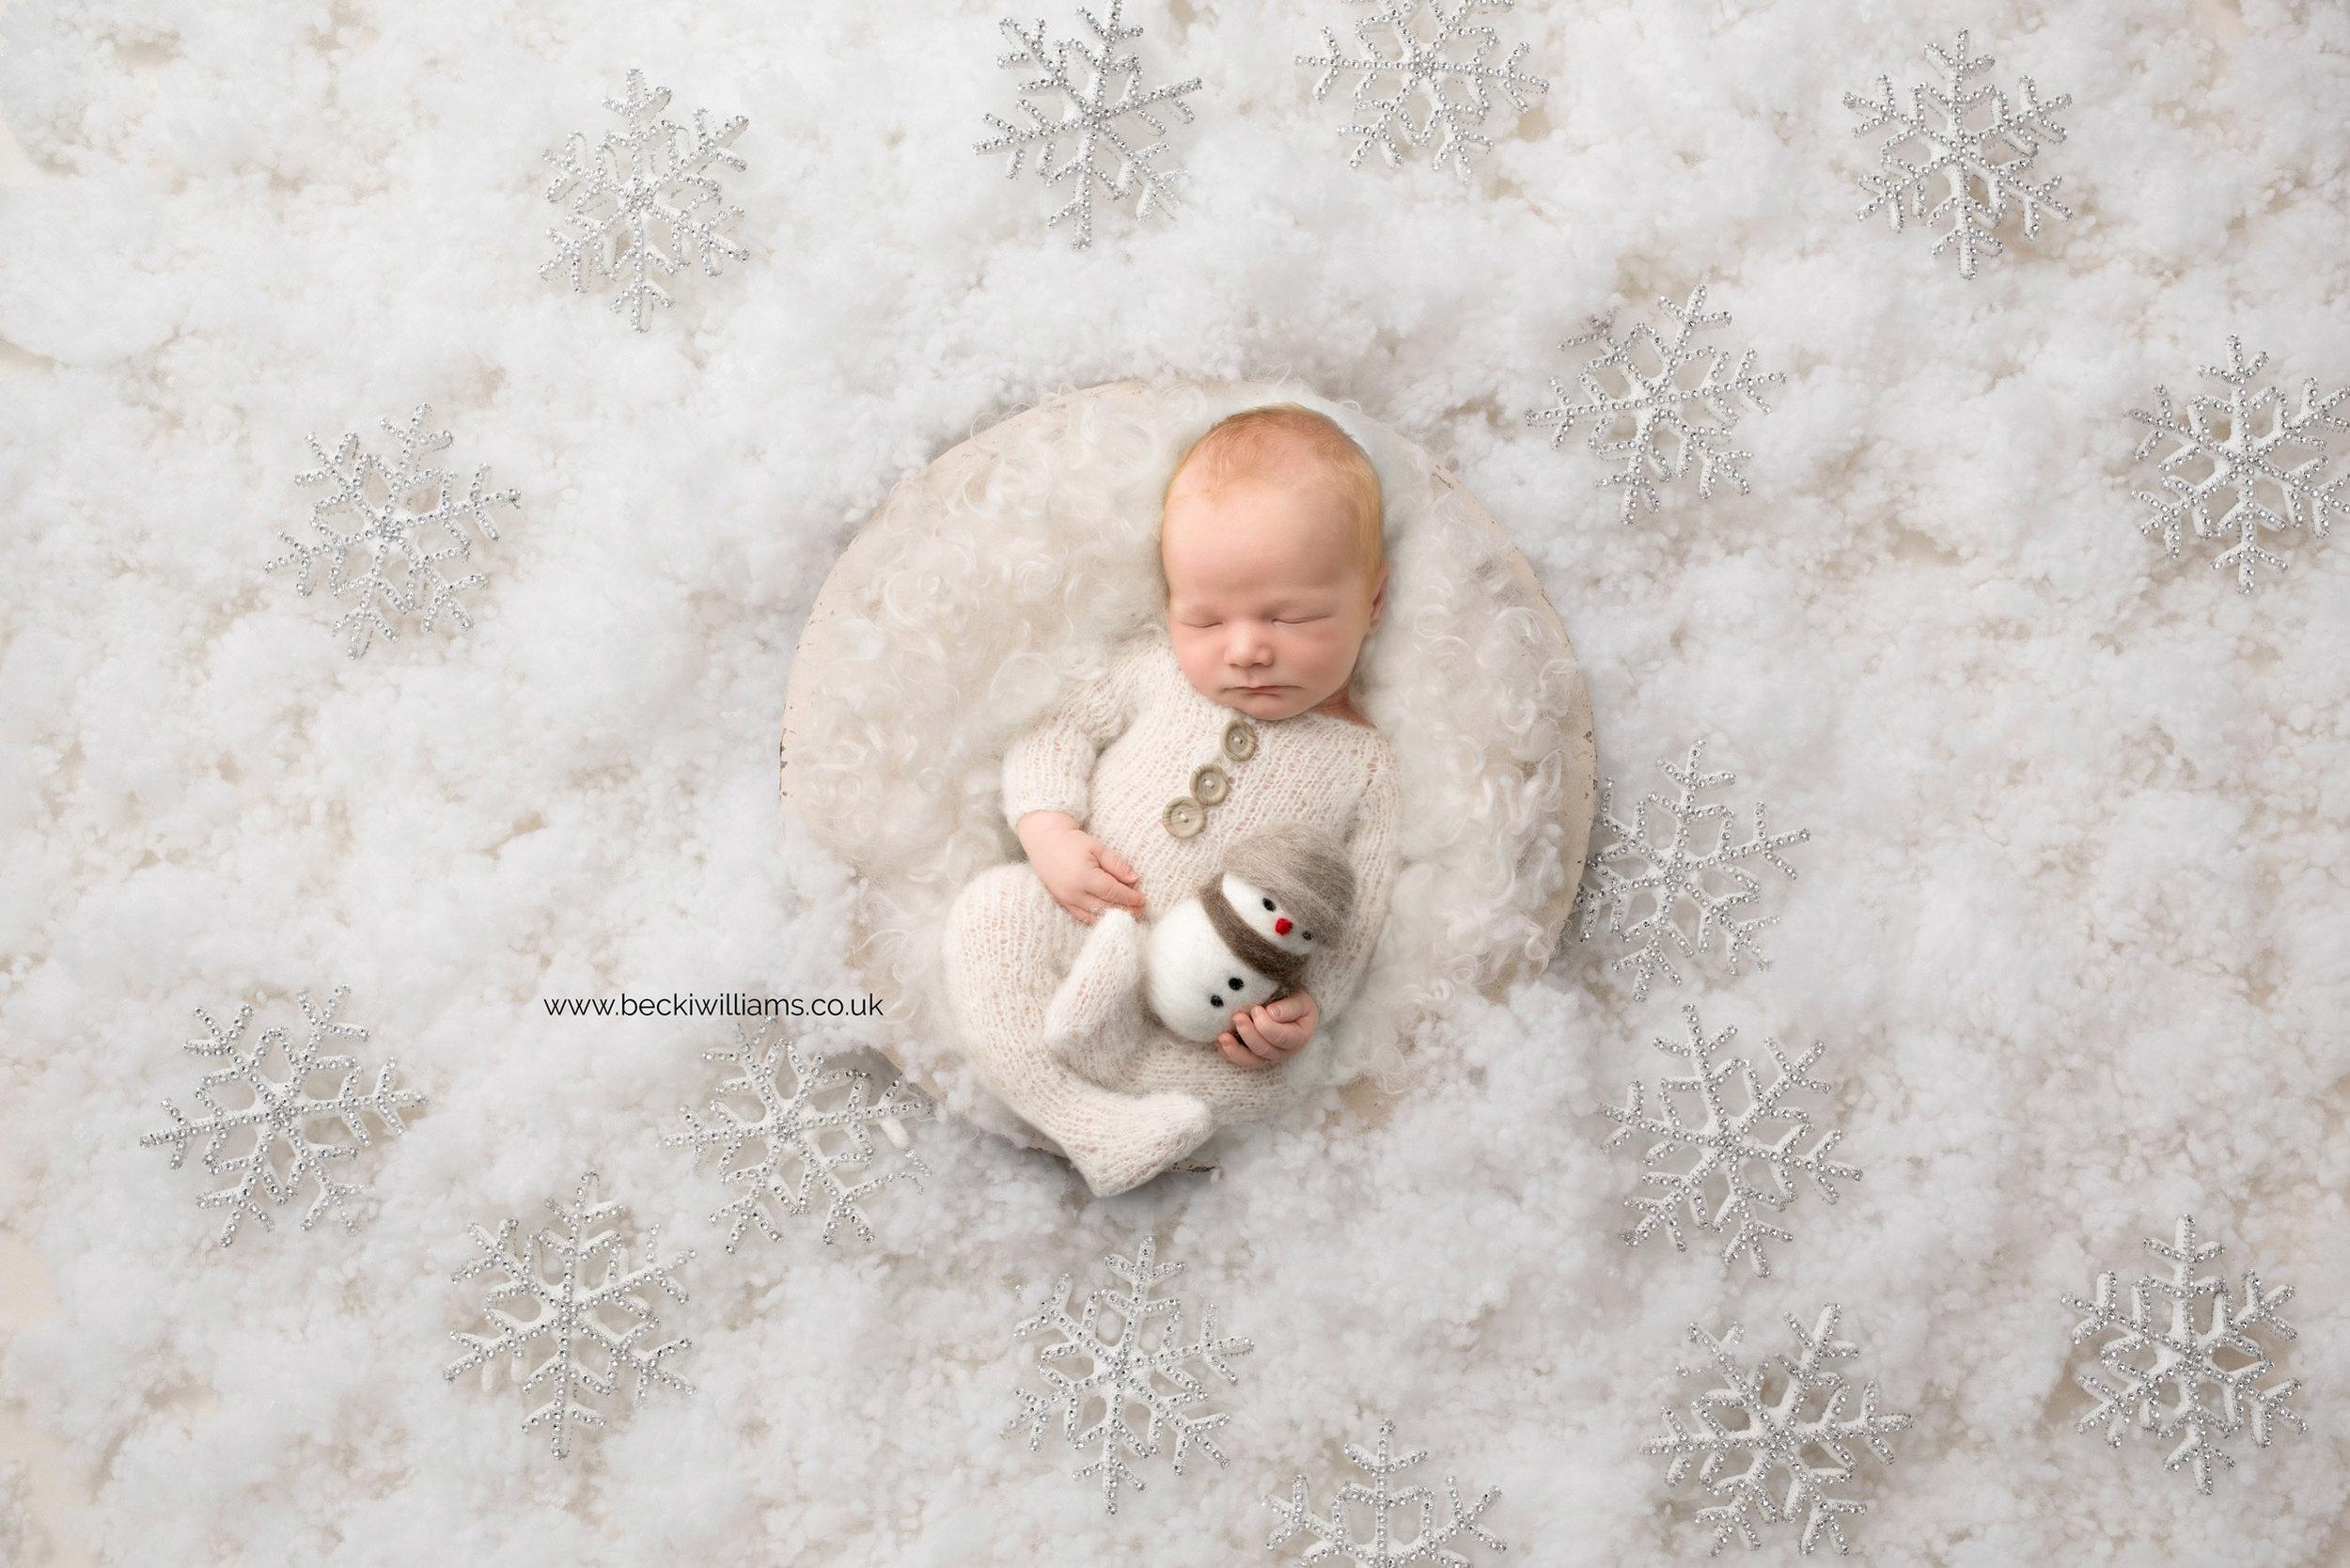 newborn-boy-portraits-hemel-hempstead-christmas-digital-background-snow-flake.jpg